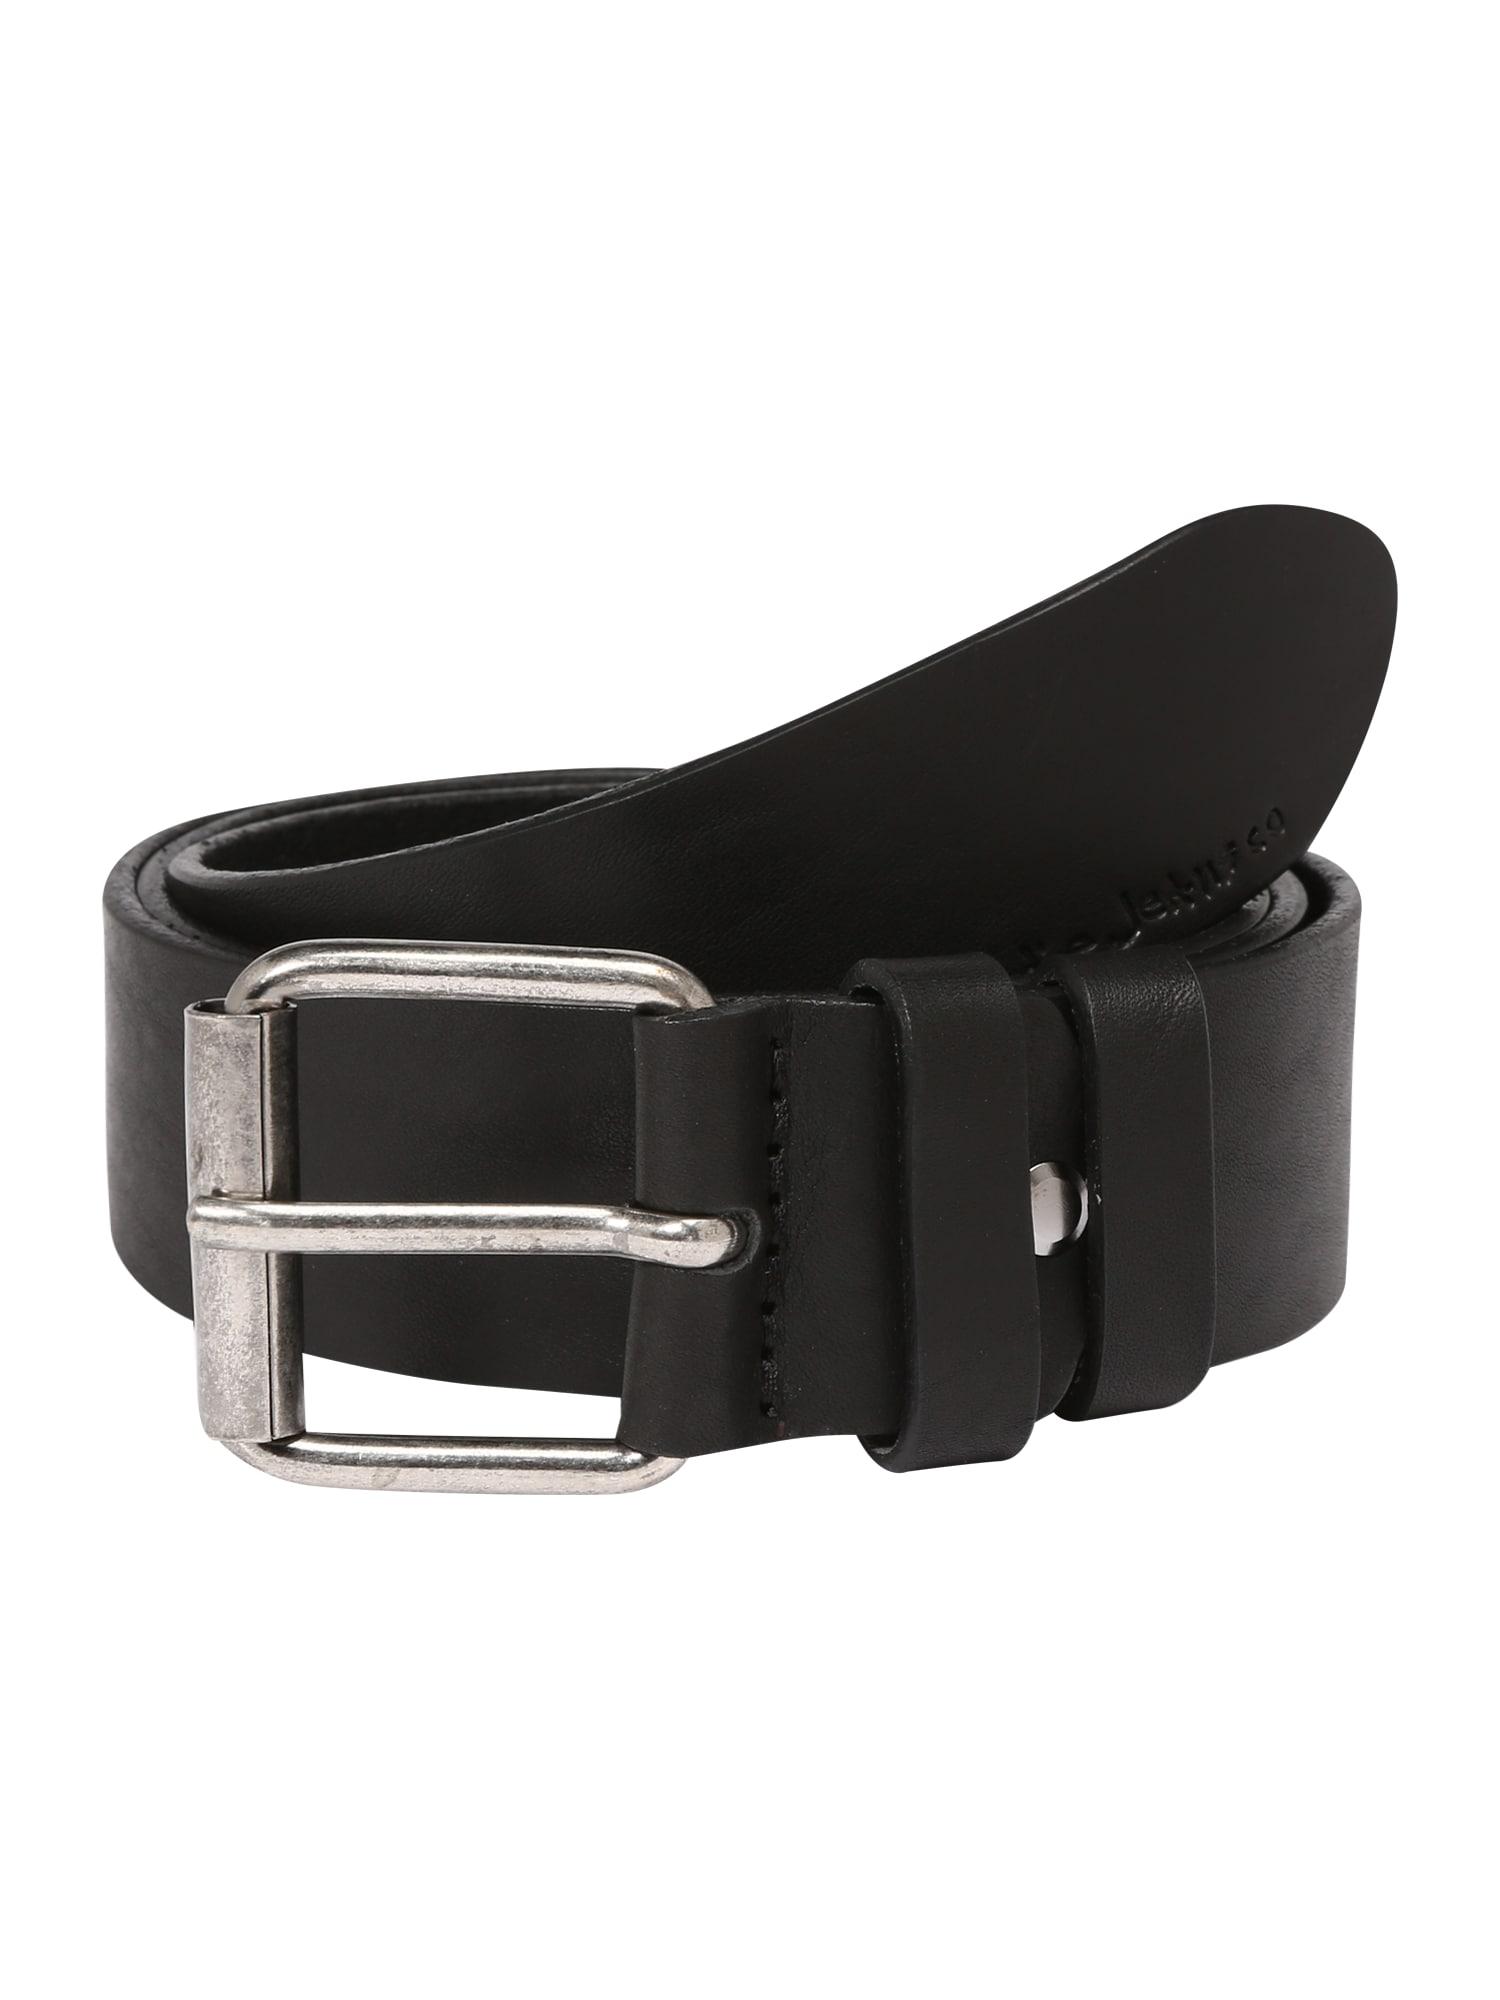 Opasek Pedersson Leather Belt černá Nudie Jeans Co